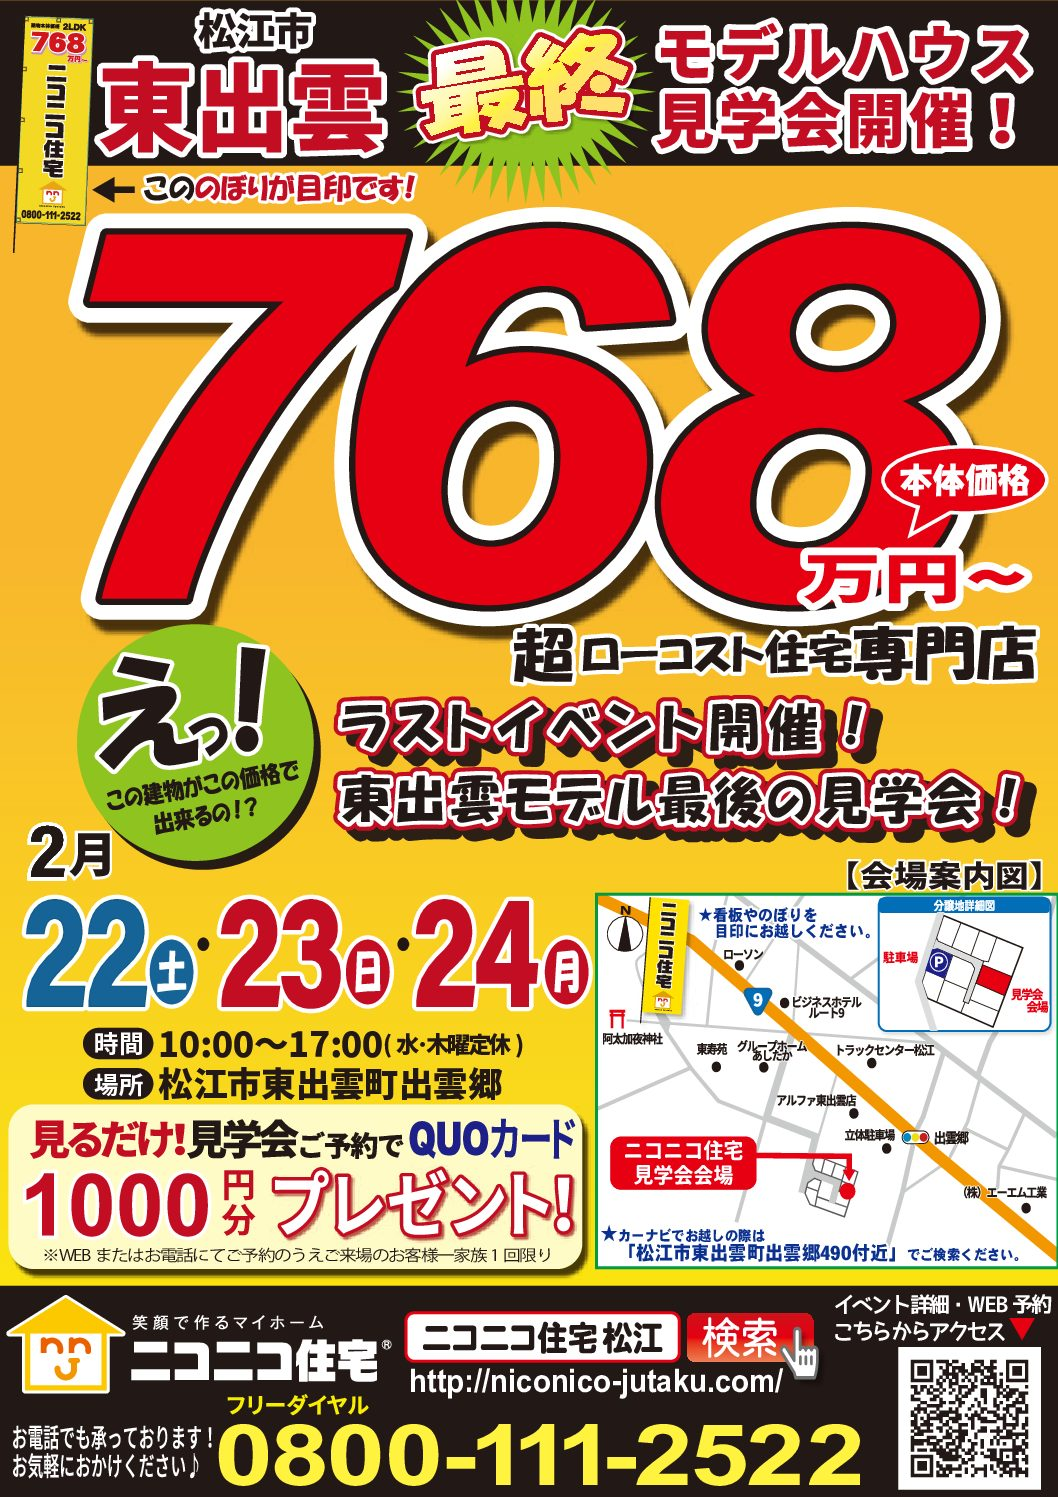 松江 明日 の 天気